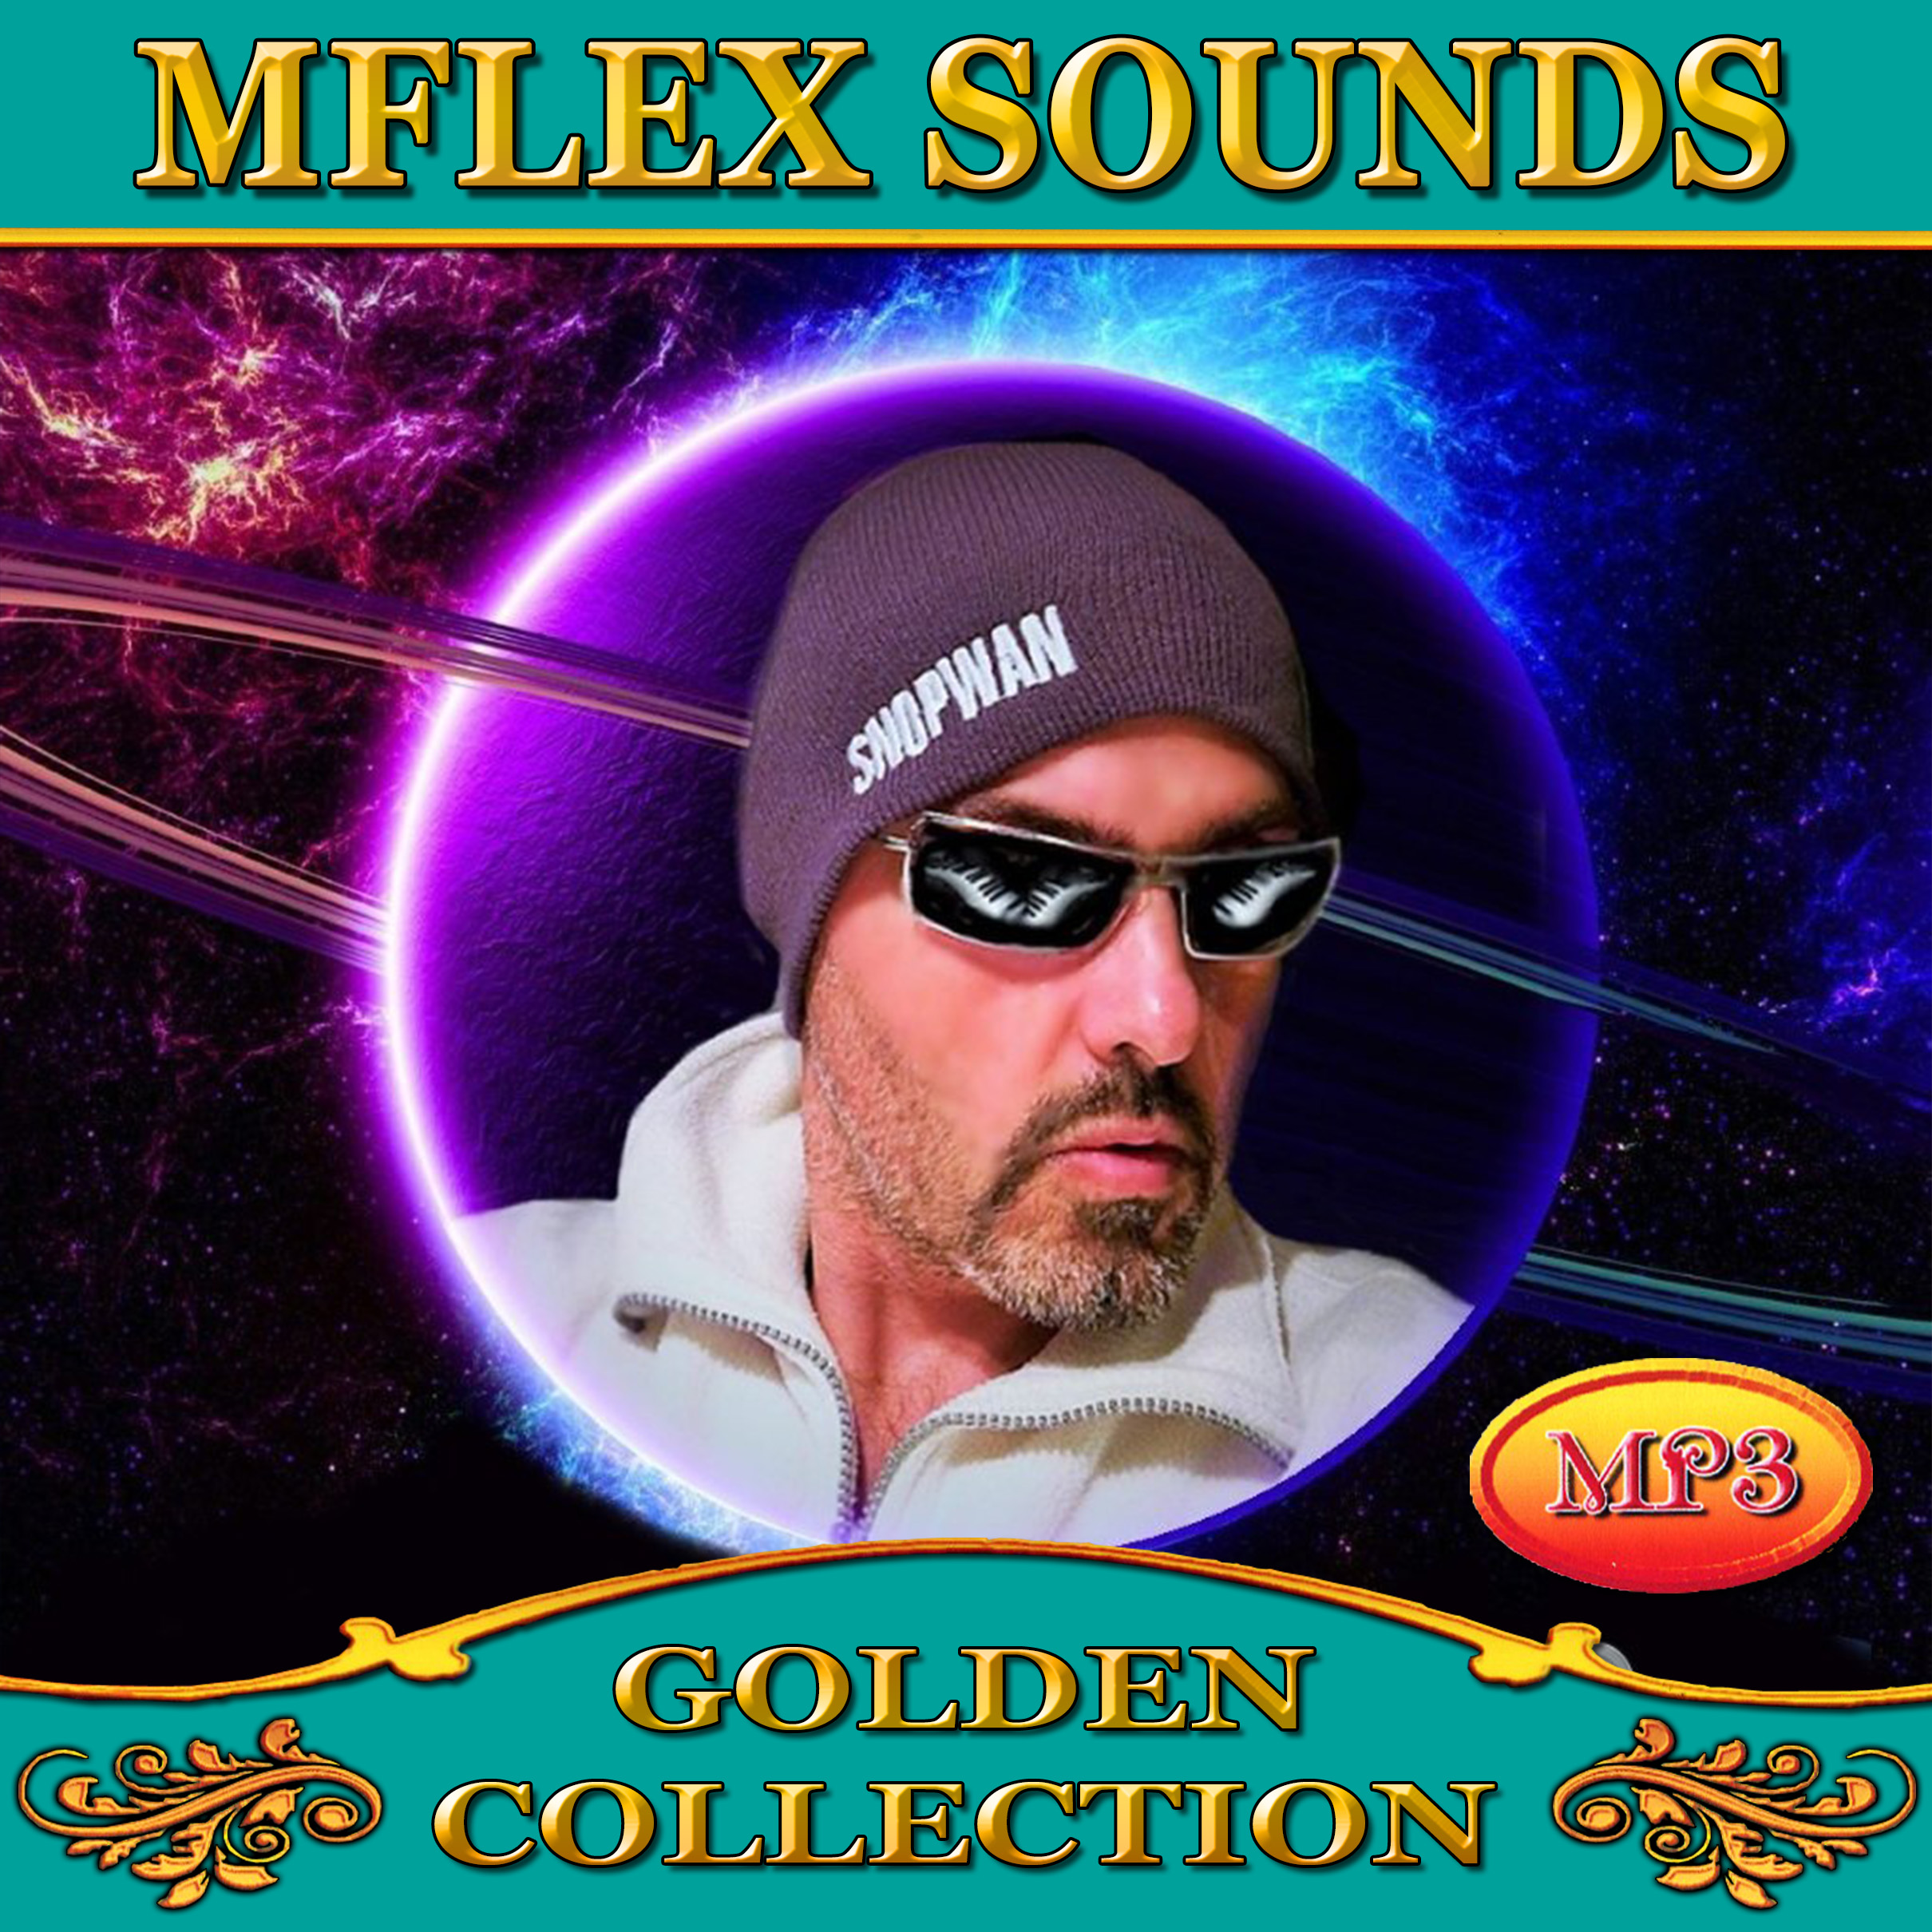 Mflex Sounds [mp3]